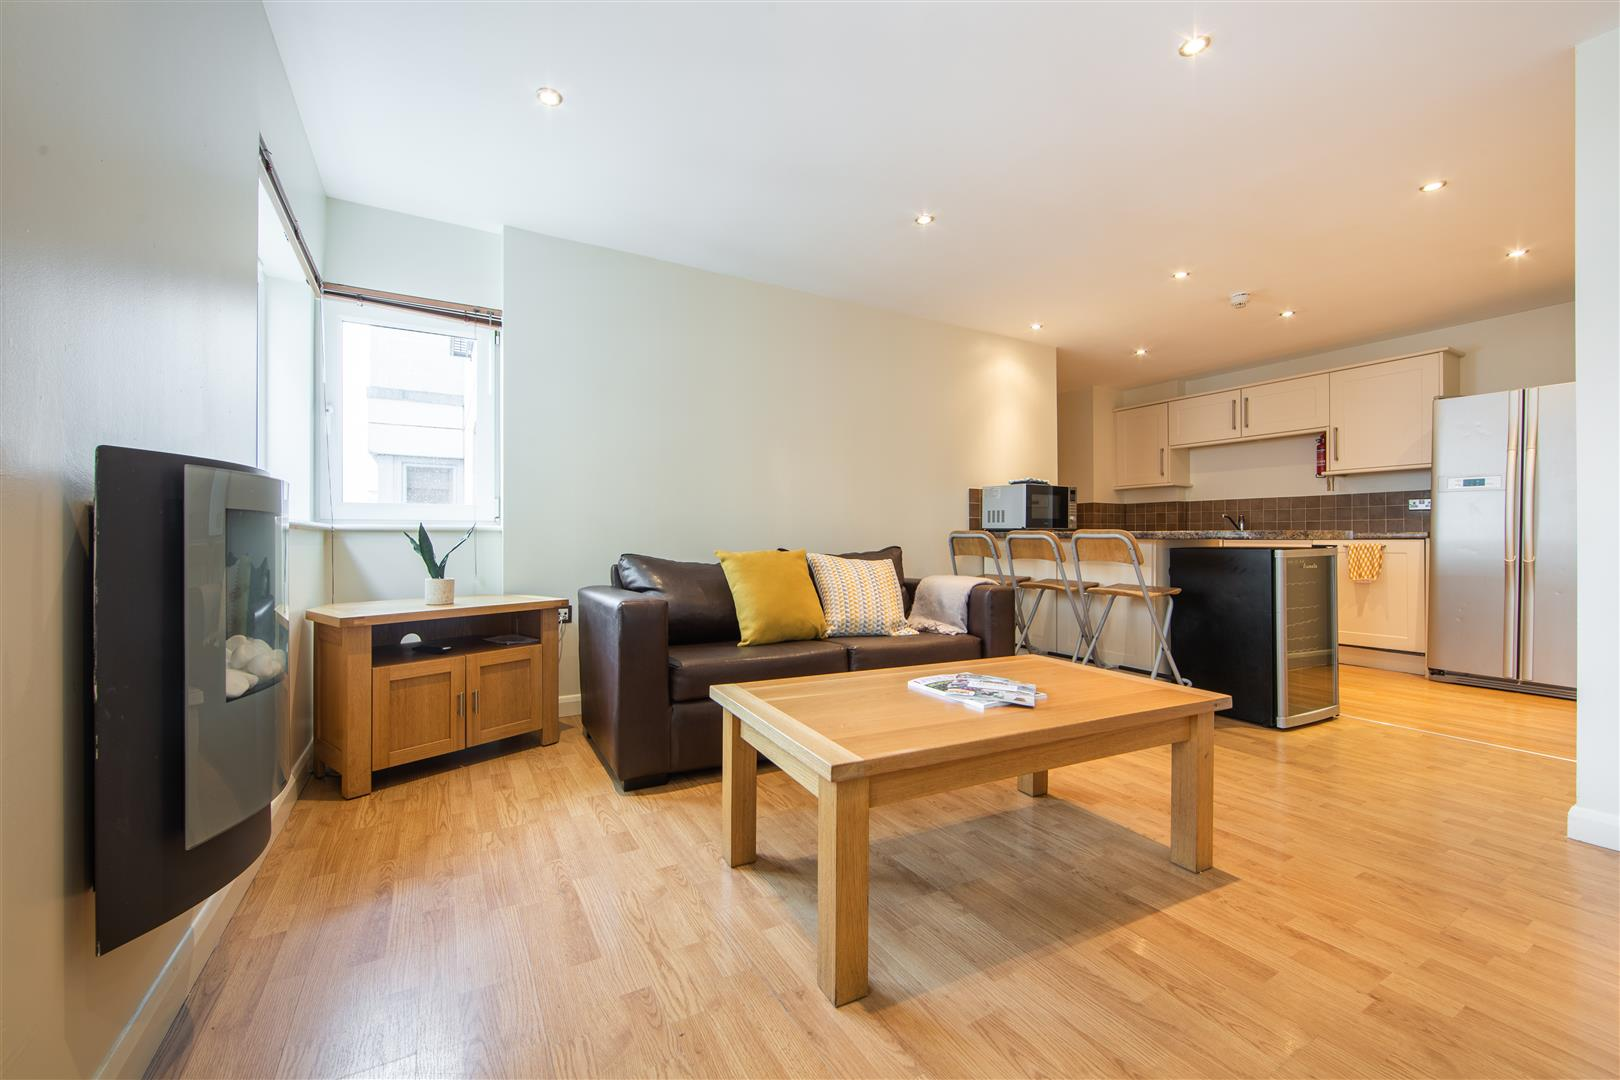 Stepney Lane Newcastle Upon Tyne, 4 Bedrooms  Flat - purpose built ,To Let